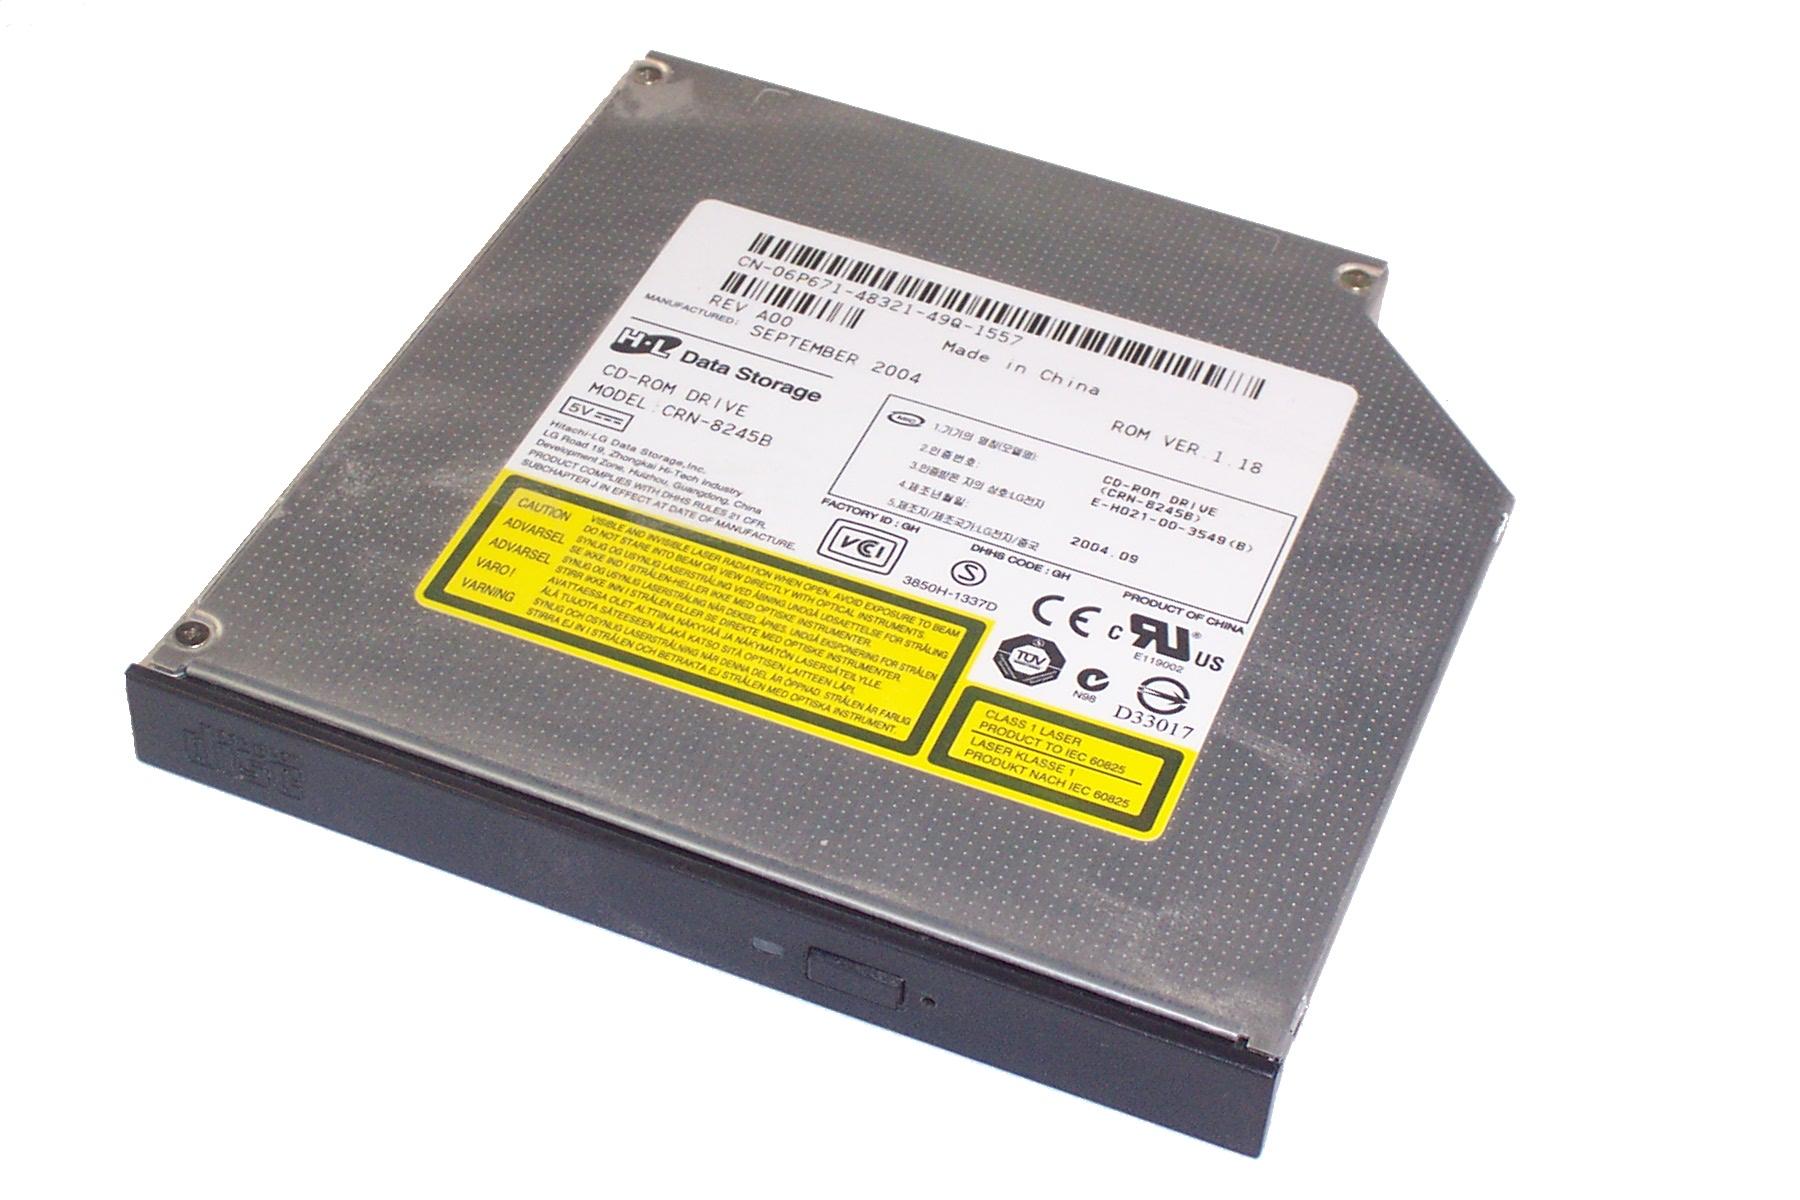 LG CD-ROM CRN-8245B DRIVERS FOR WINDOWS 7